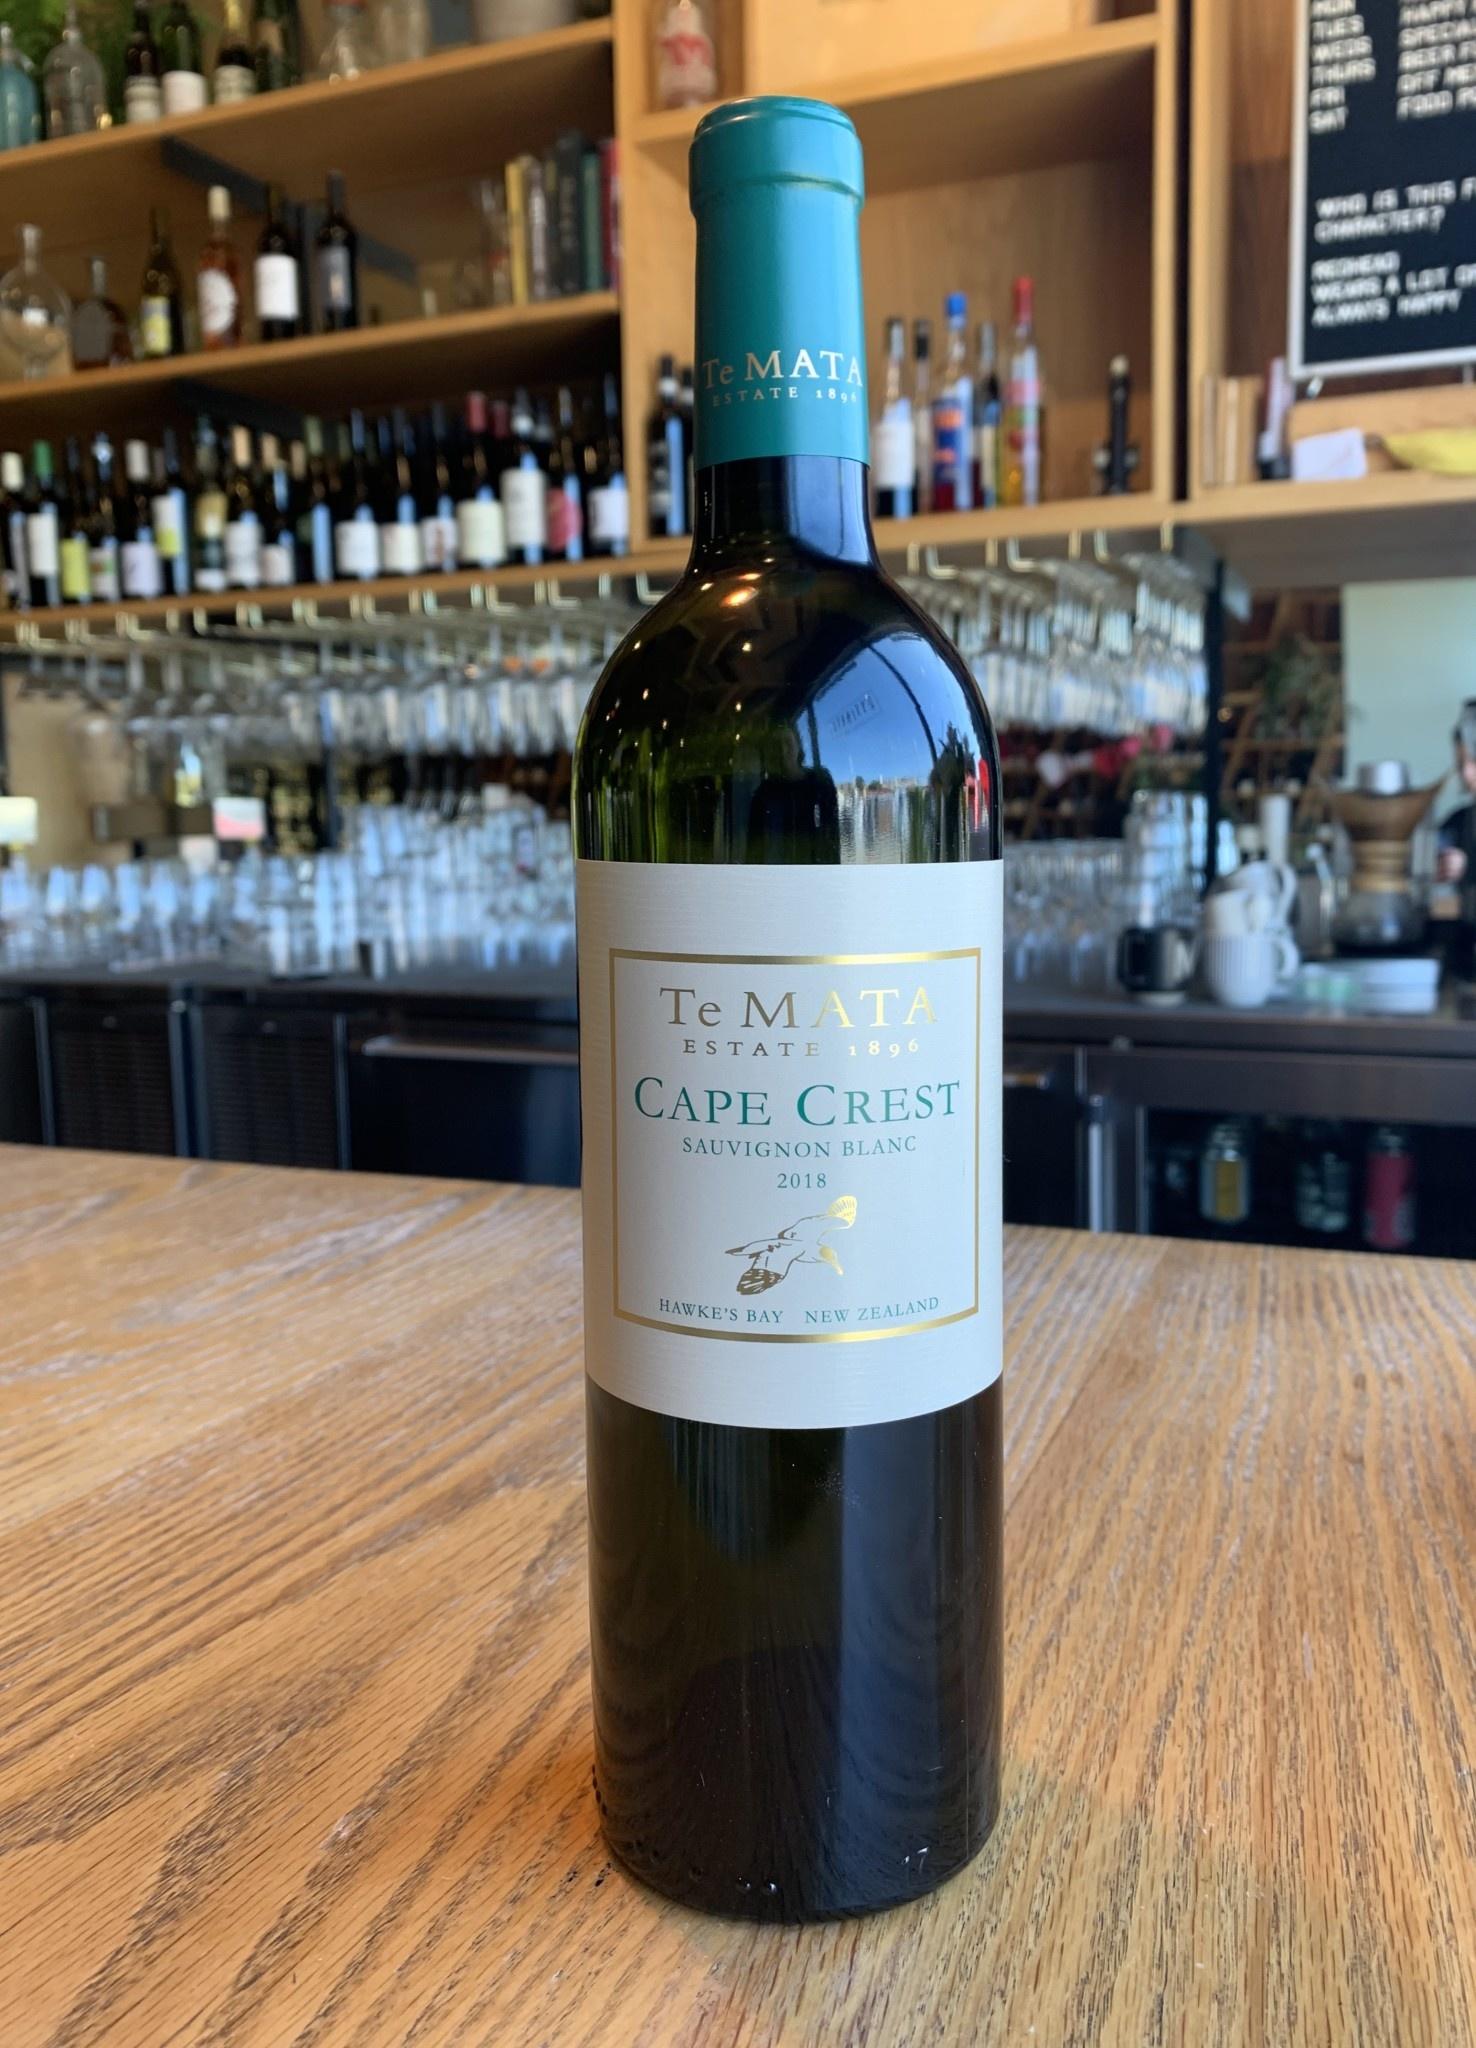 Te Mata 2018 Te Mata Cape Crest Sauvignon Blanc 750ml